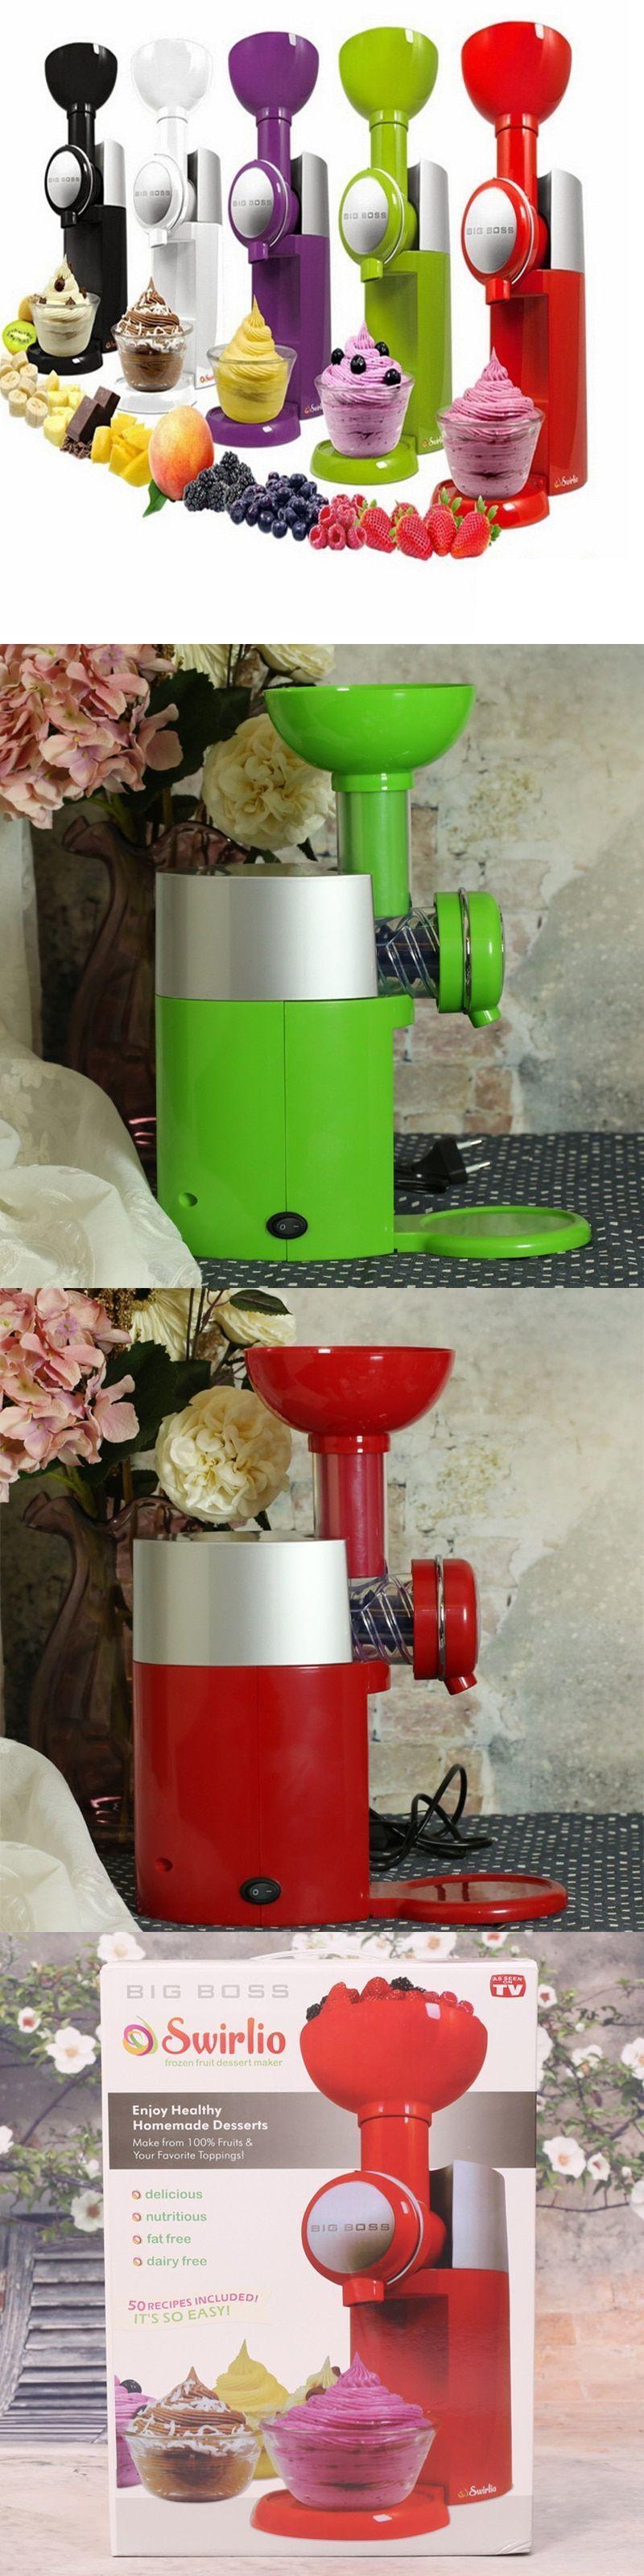 Fruit dessert machine automatic frozen fruit ice cream